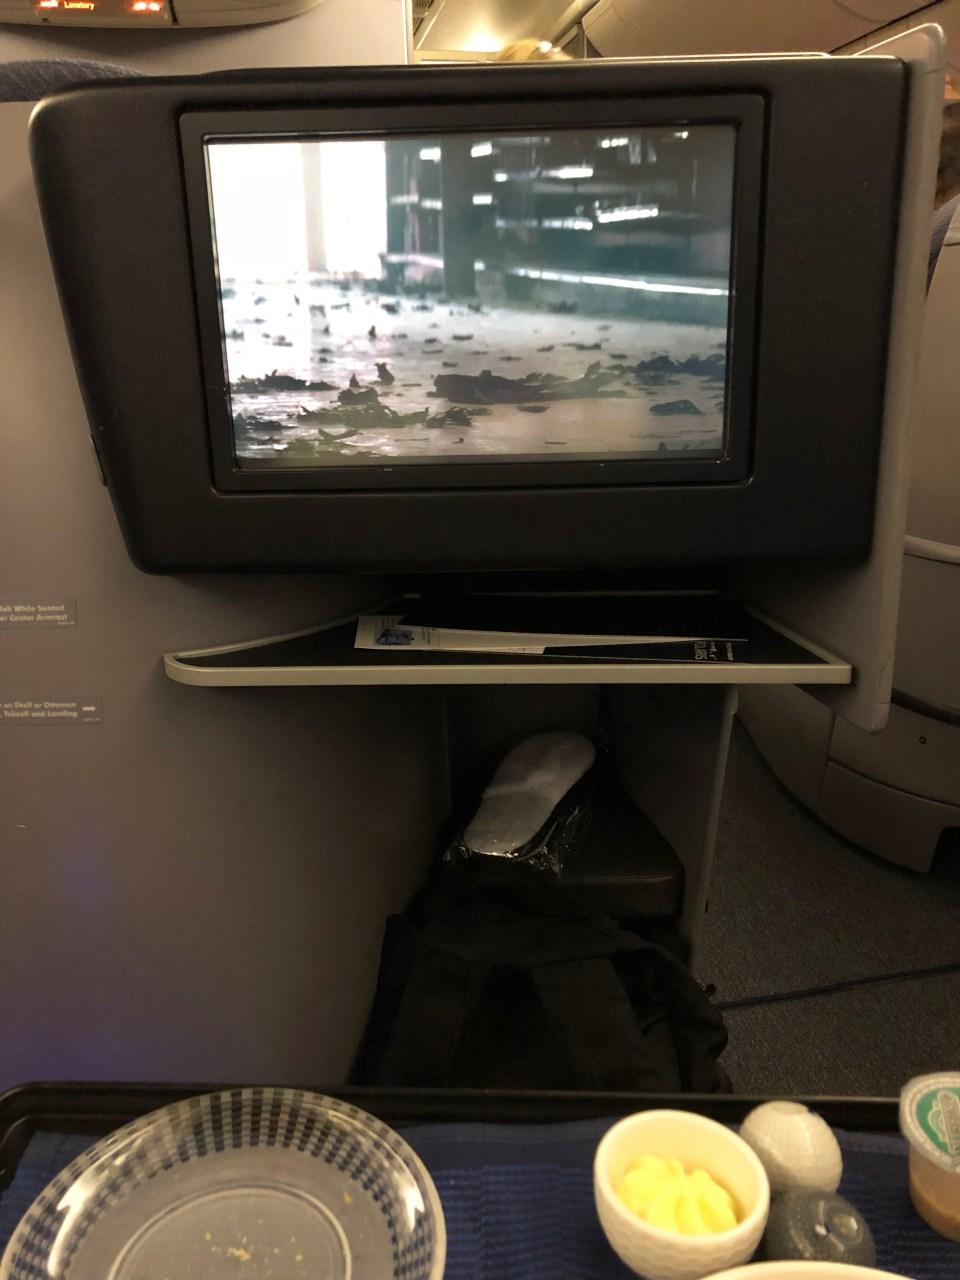 United Airlines - movie